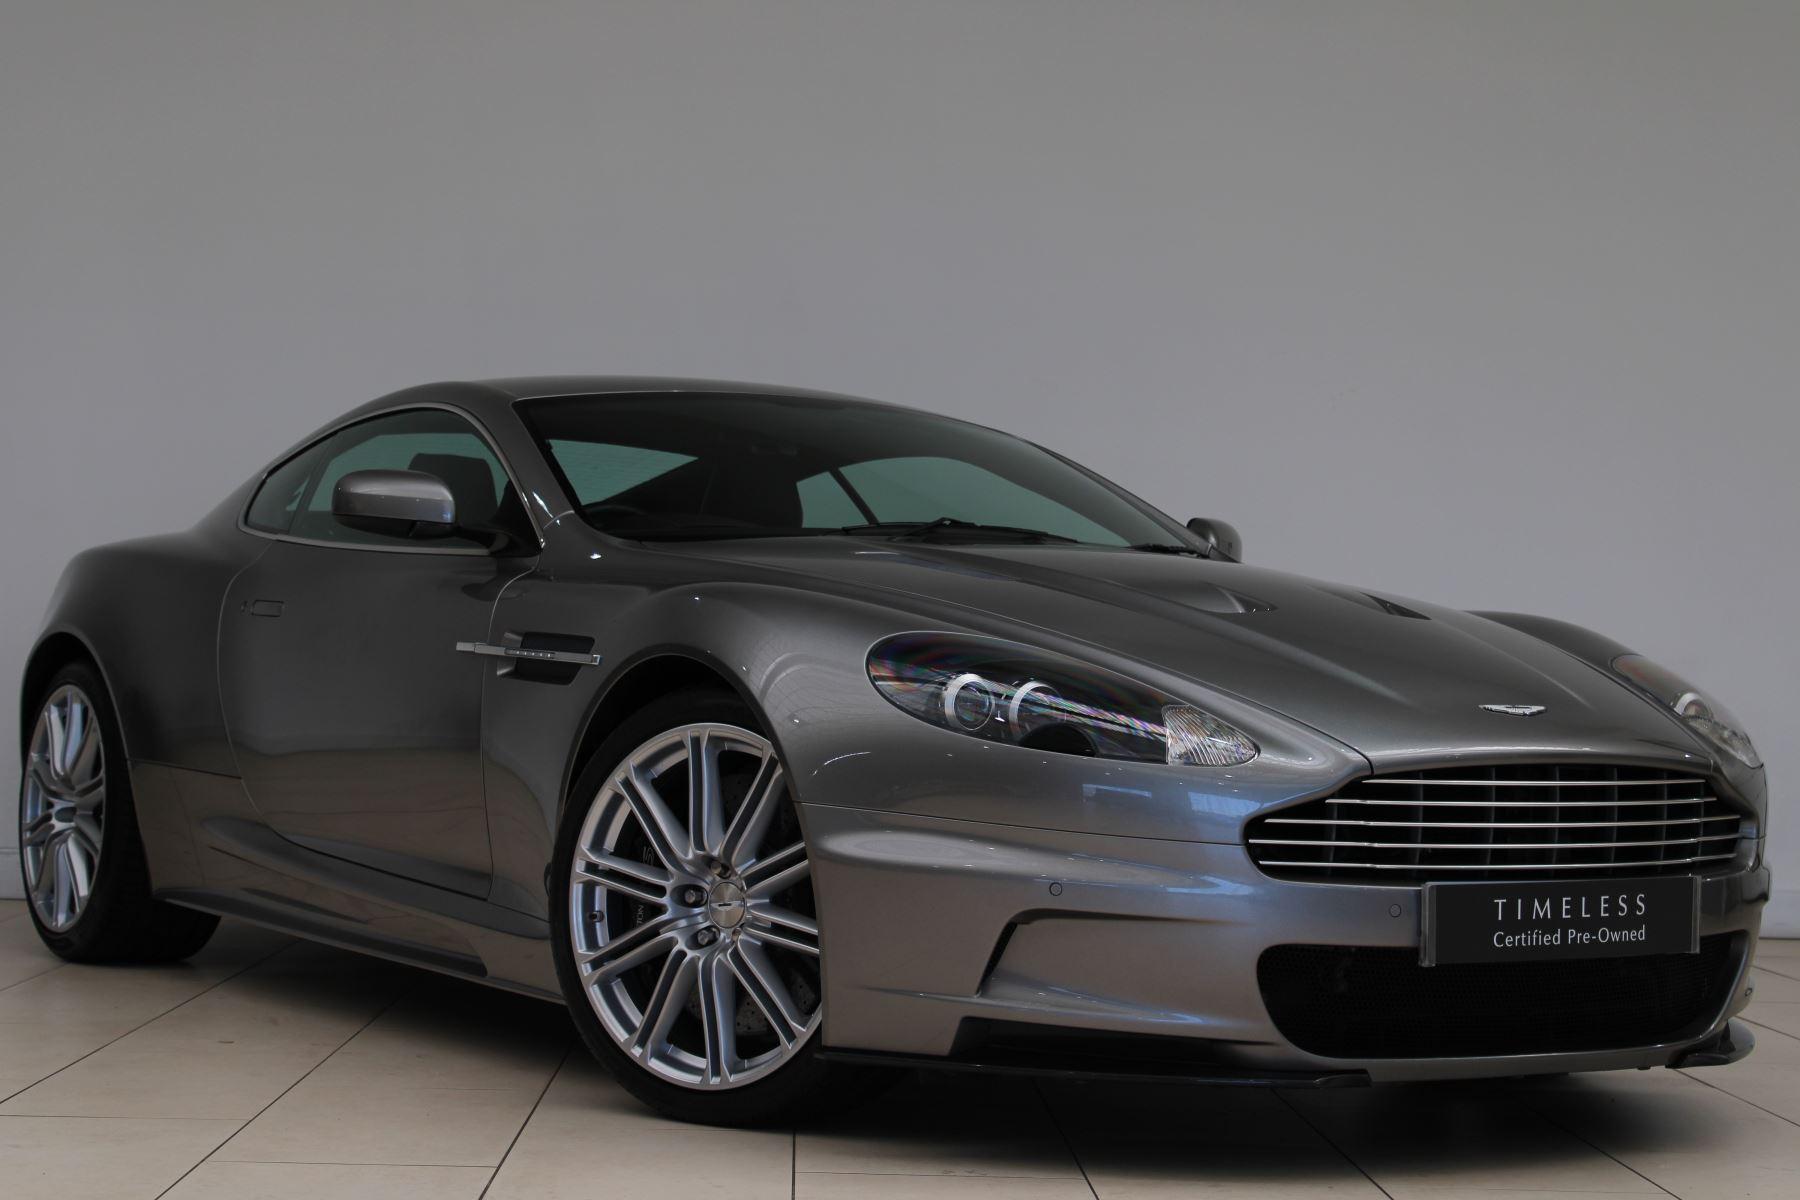 Aston Martin DBS V12 Tungsten Silver 5935.0 Automatic 2 door Coupe